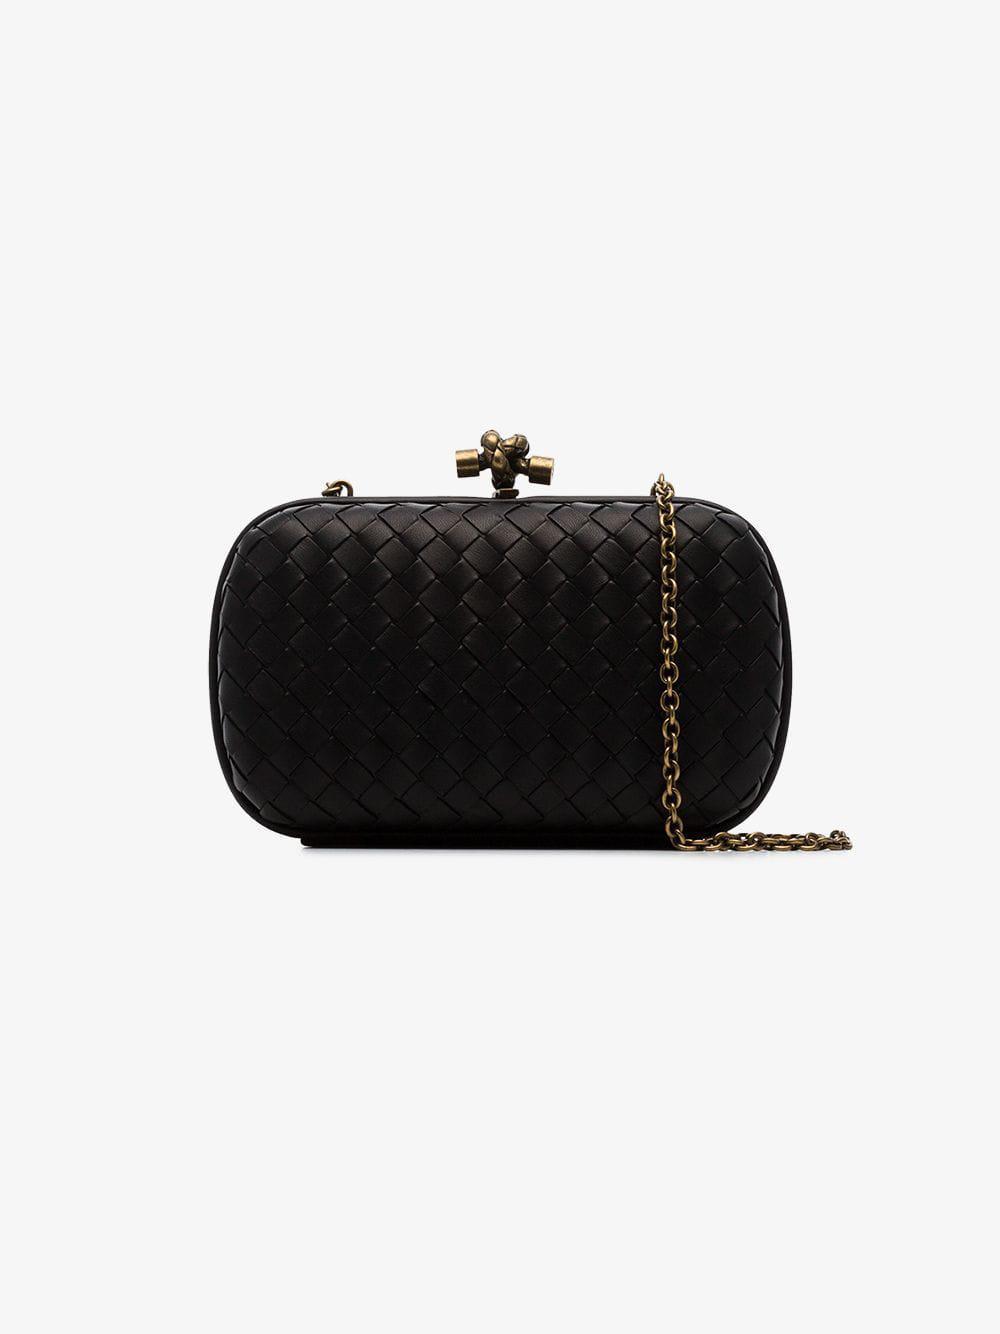 Lyst - Bottega Veneta Black Knot Detail Woven Leather Clutch Bag in ... 87605a574ab8b